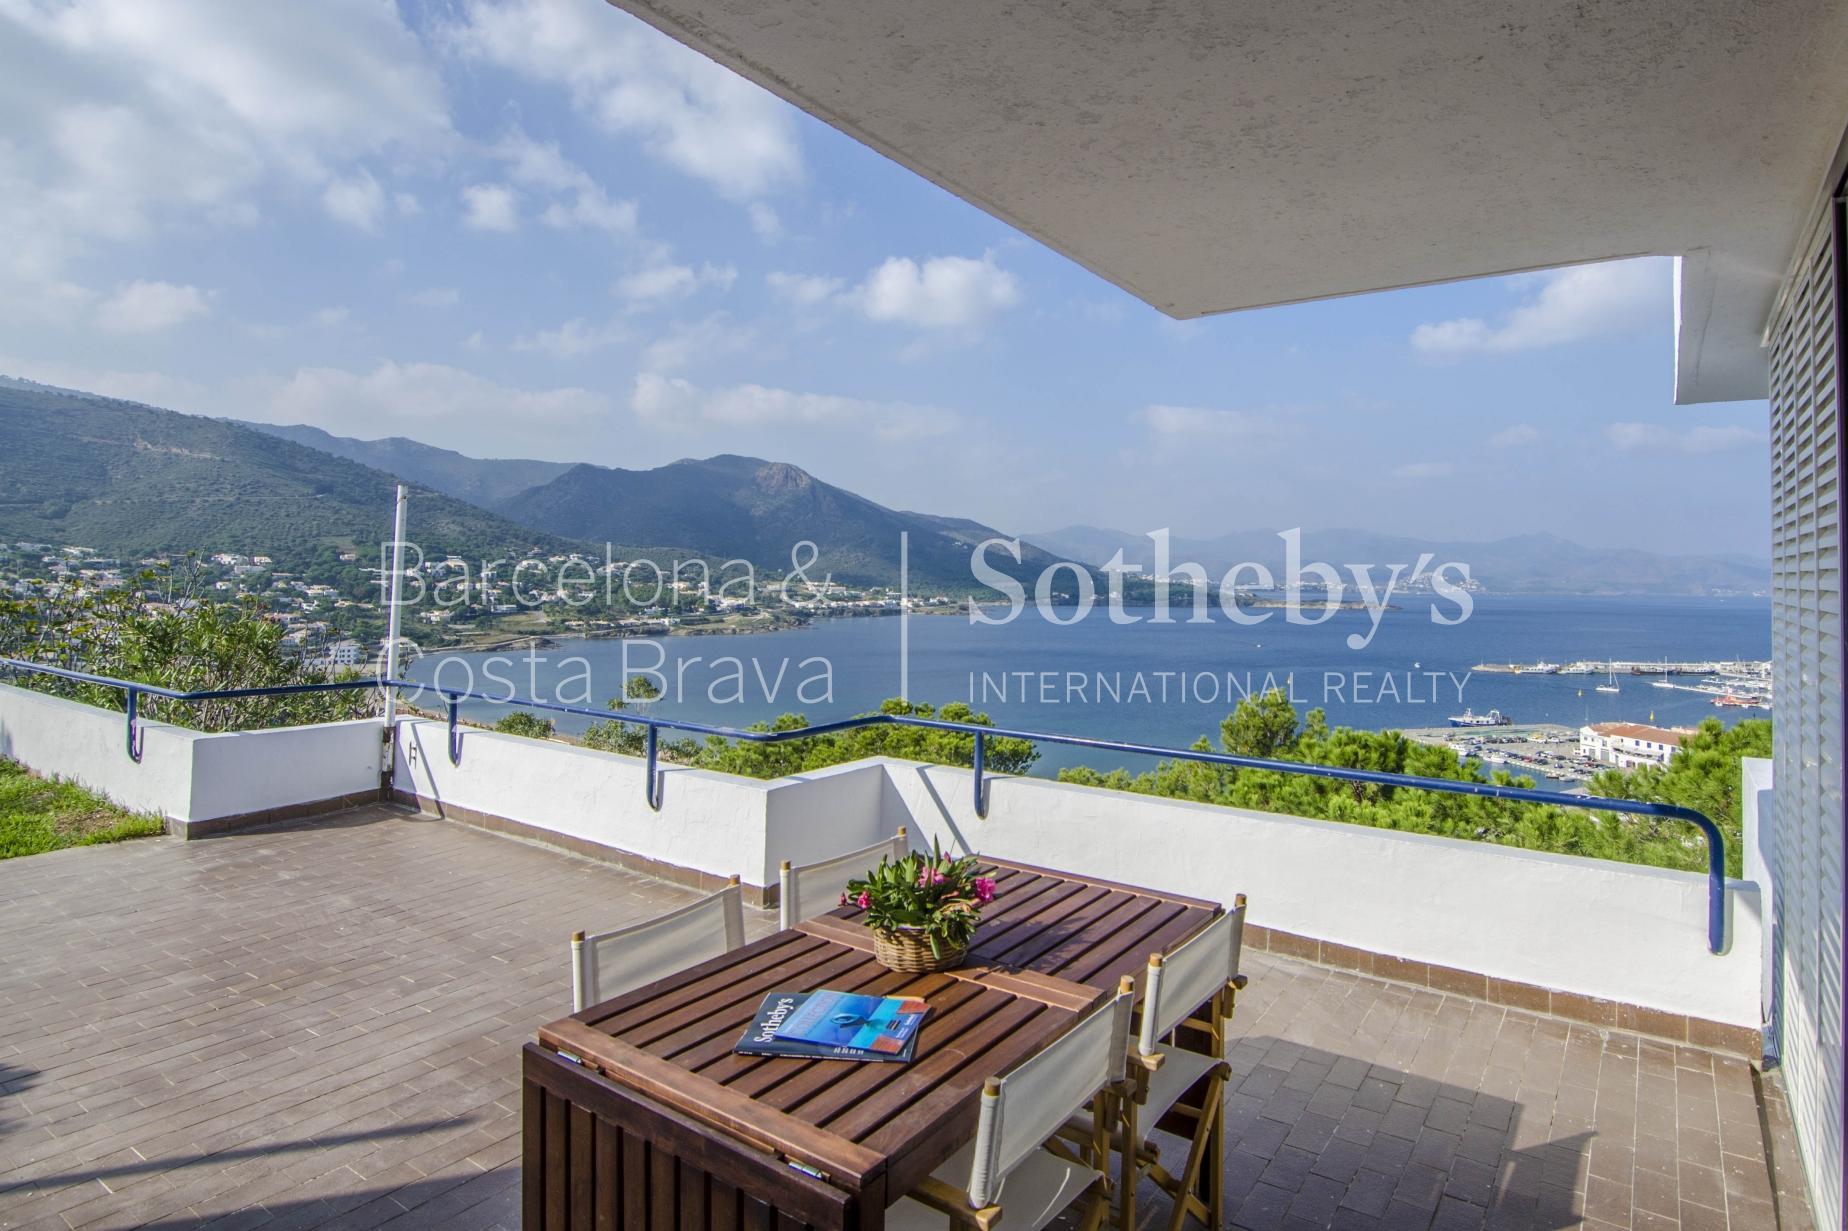 Single Family Home for Sale at Contemporary 70s style house with panoramic sea views El Port De La Selva, Costa Brava 17489 Spain